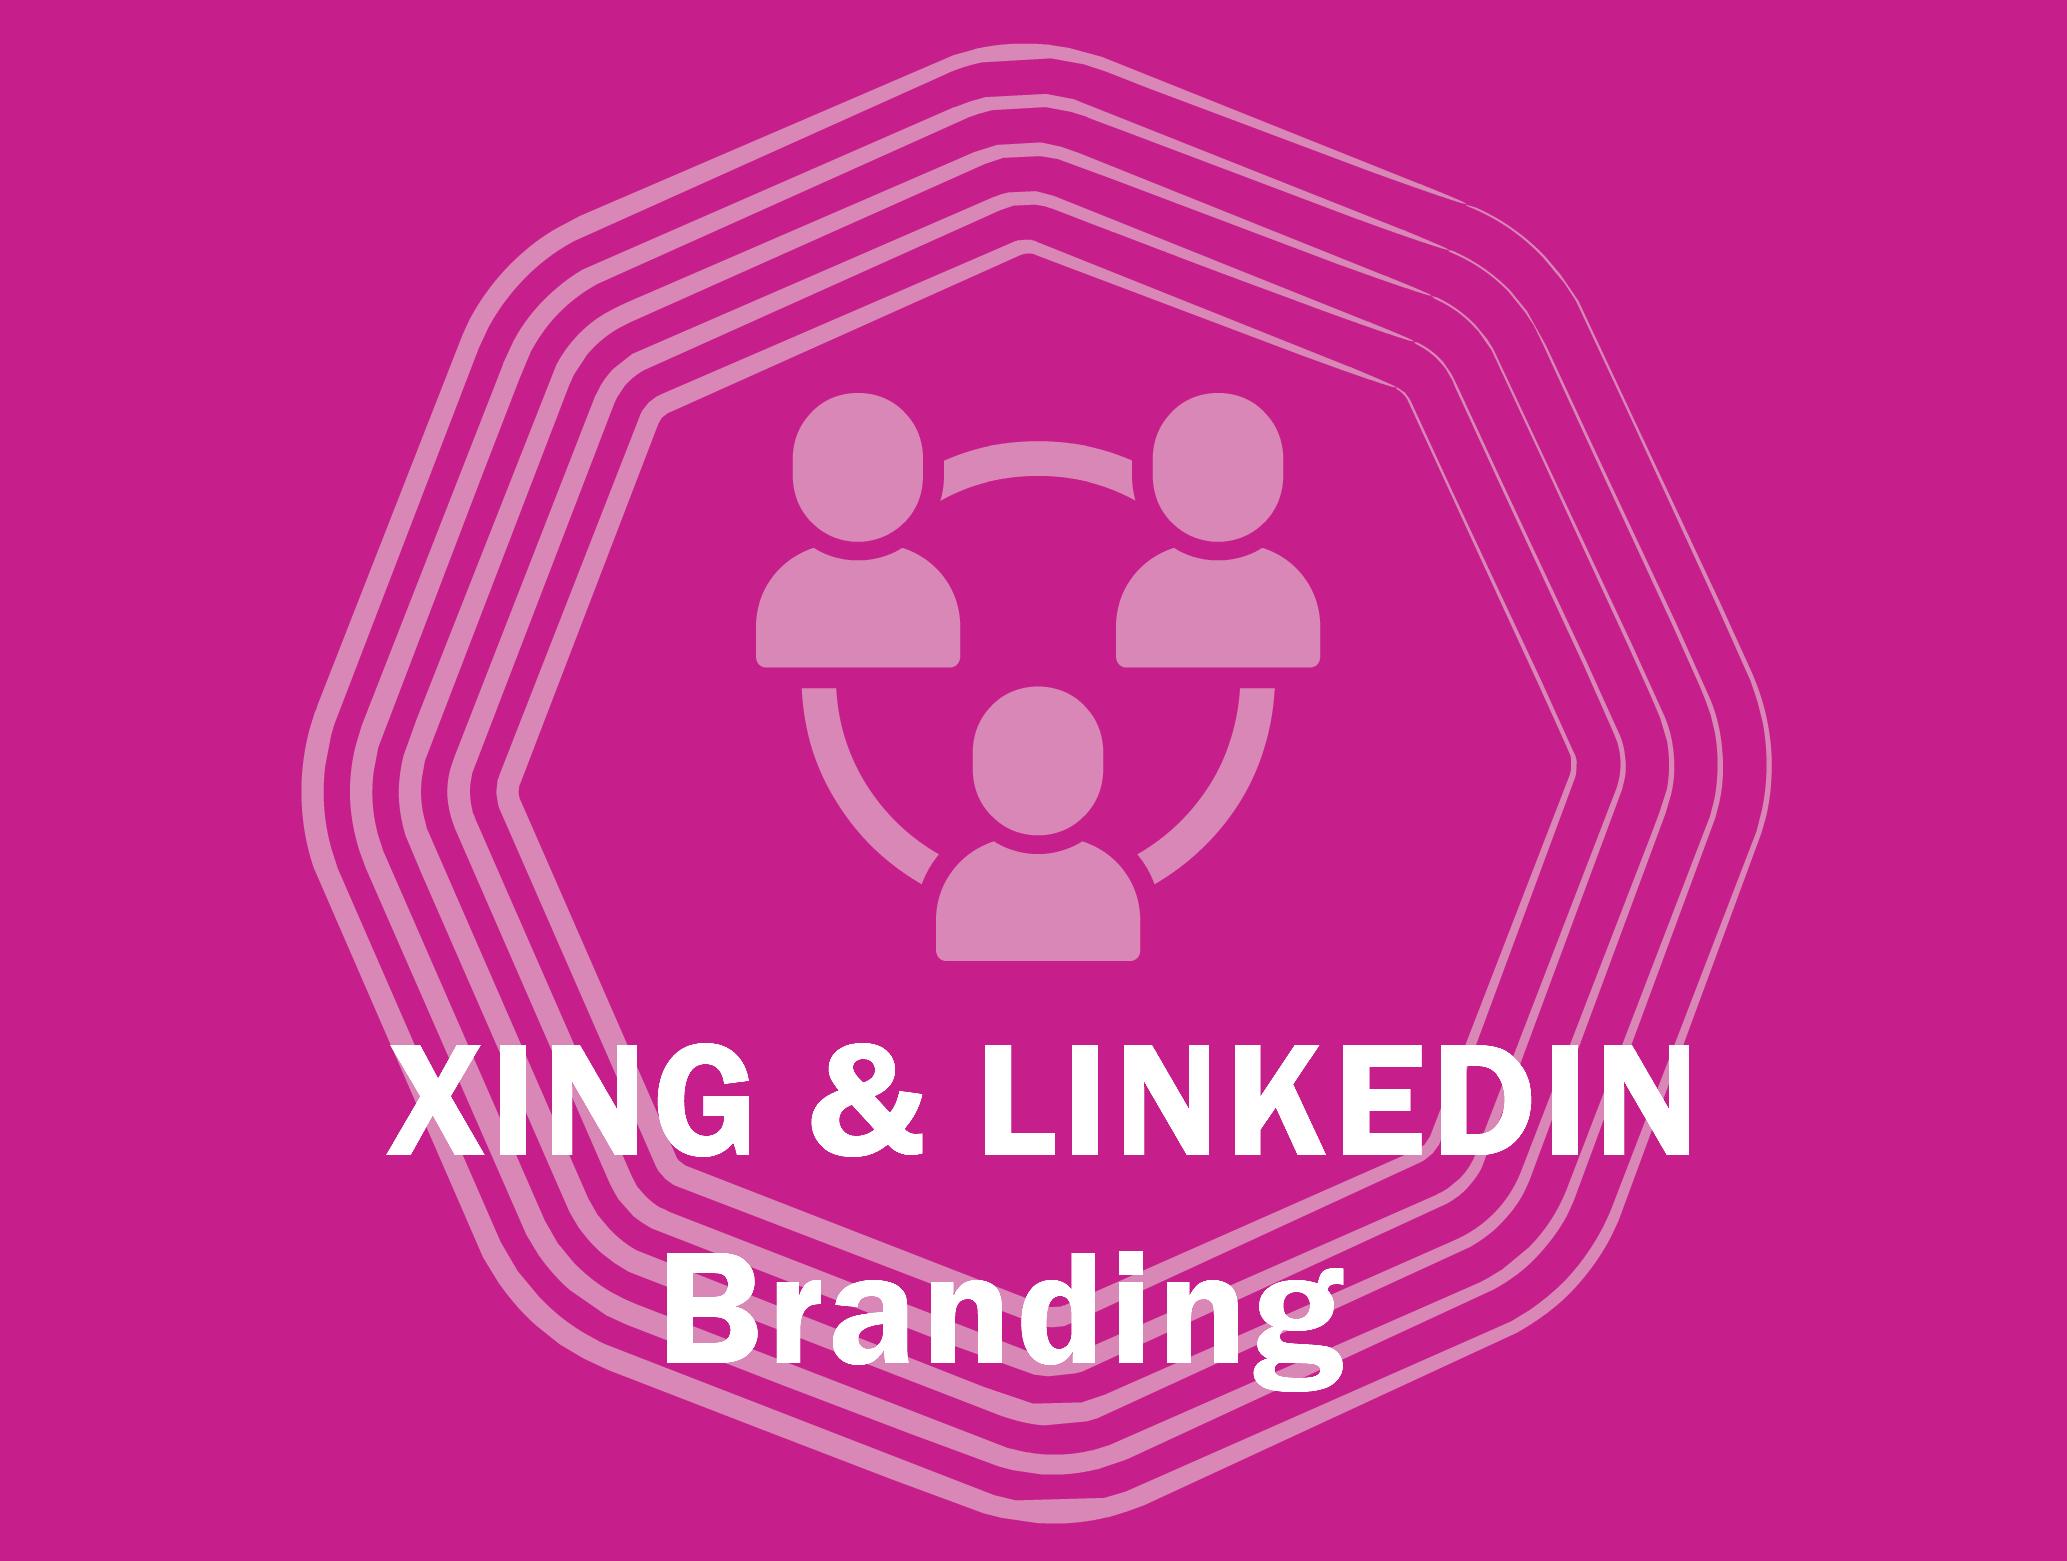 logo xing linkedin.png